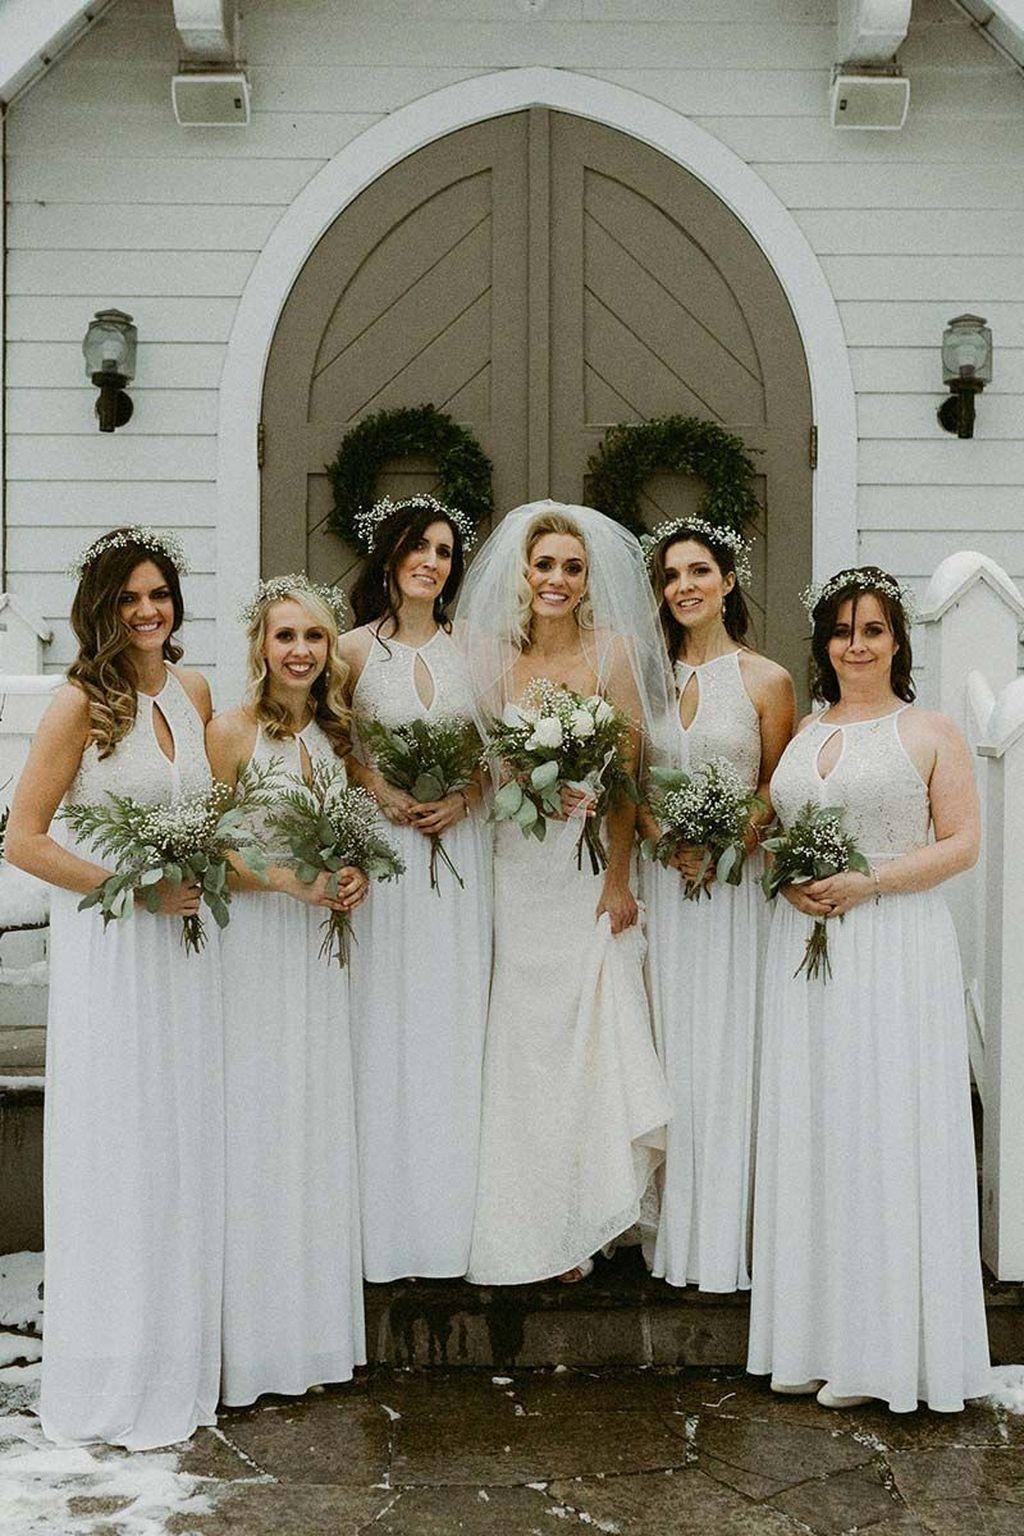 ffa0e4389a6 Awesome 48 Stunning Wedding Dresses Styles Ideas For Winter Wonderland  Weddings